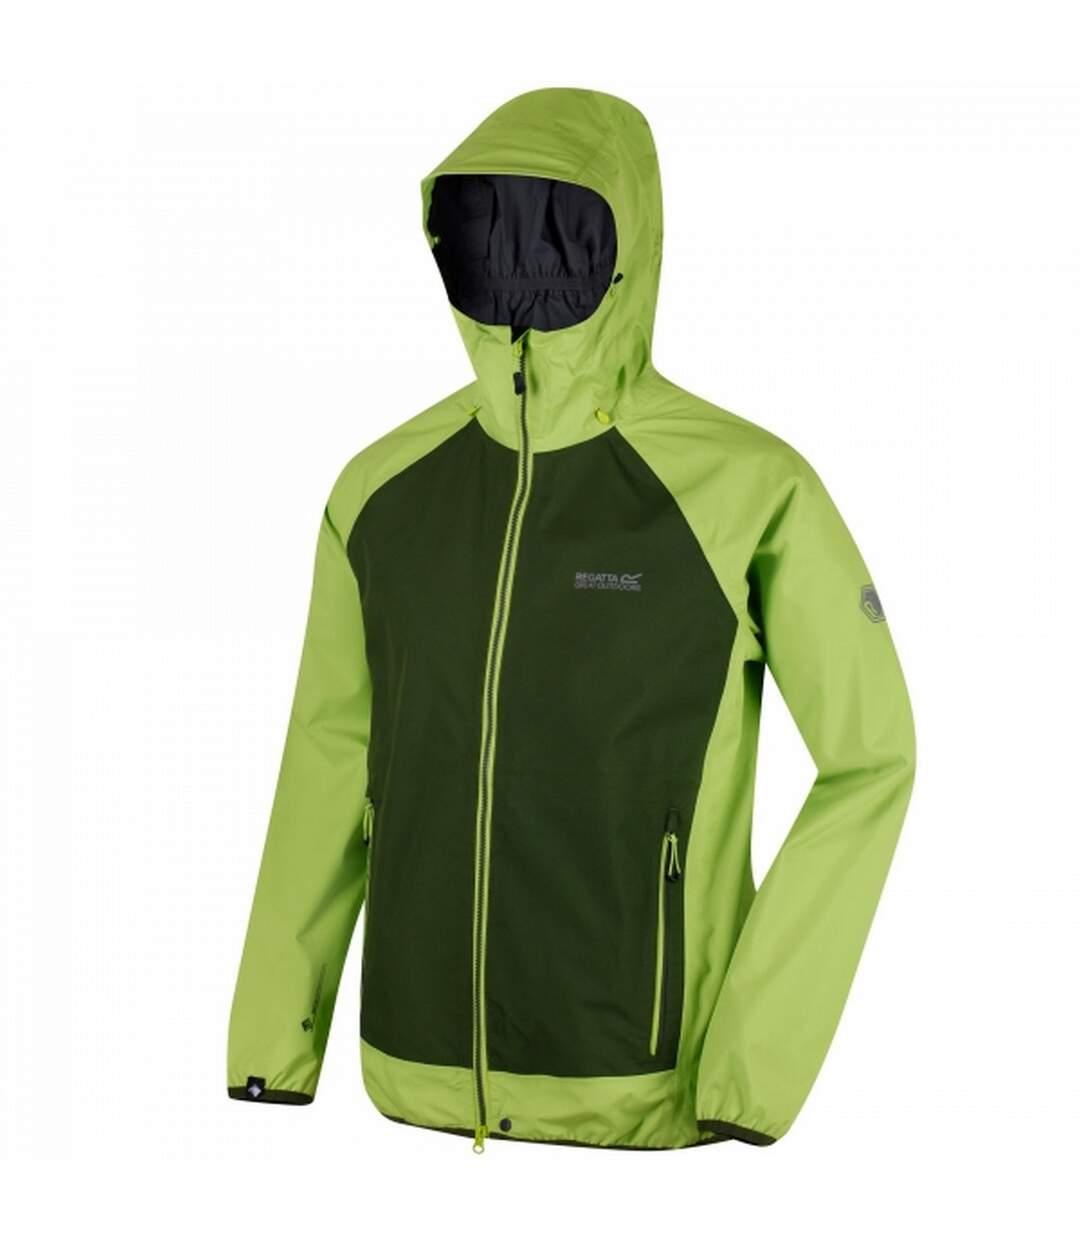 Regatta Mens Imber III Lightweight Waterproof Jacket (Lime Green/Racing Green) - UTRG3513